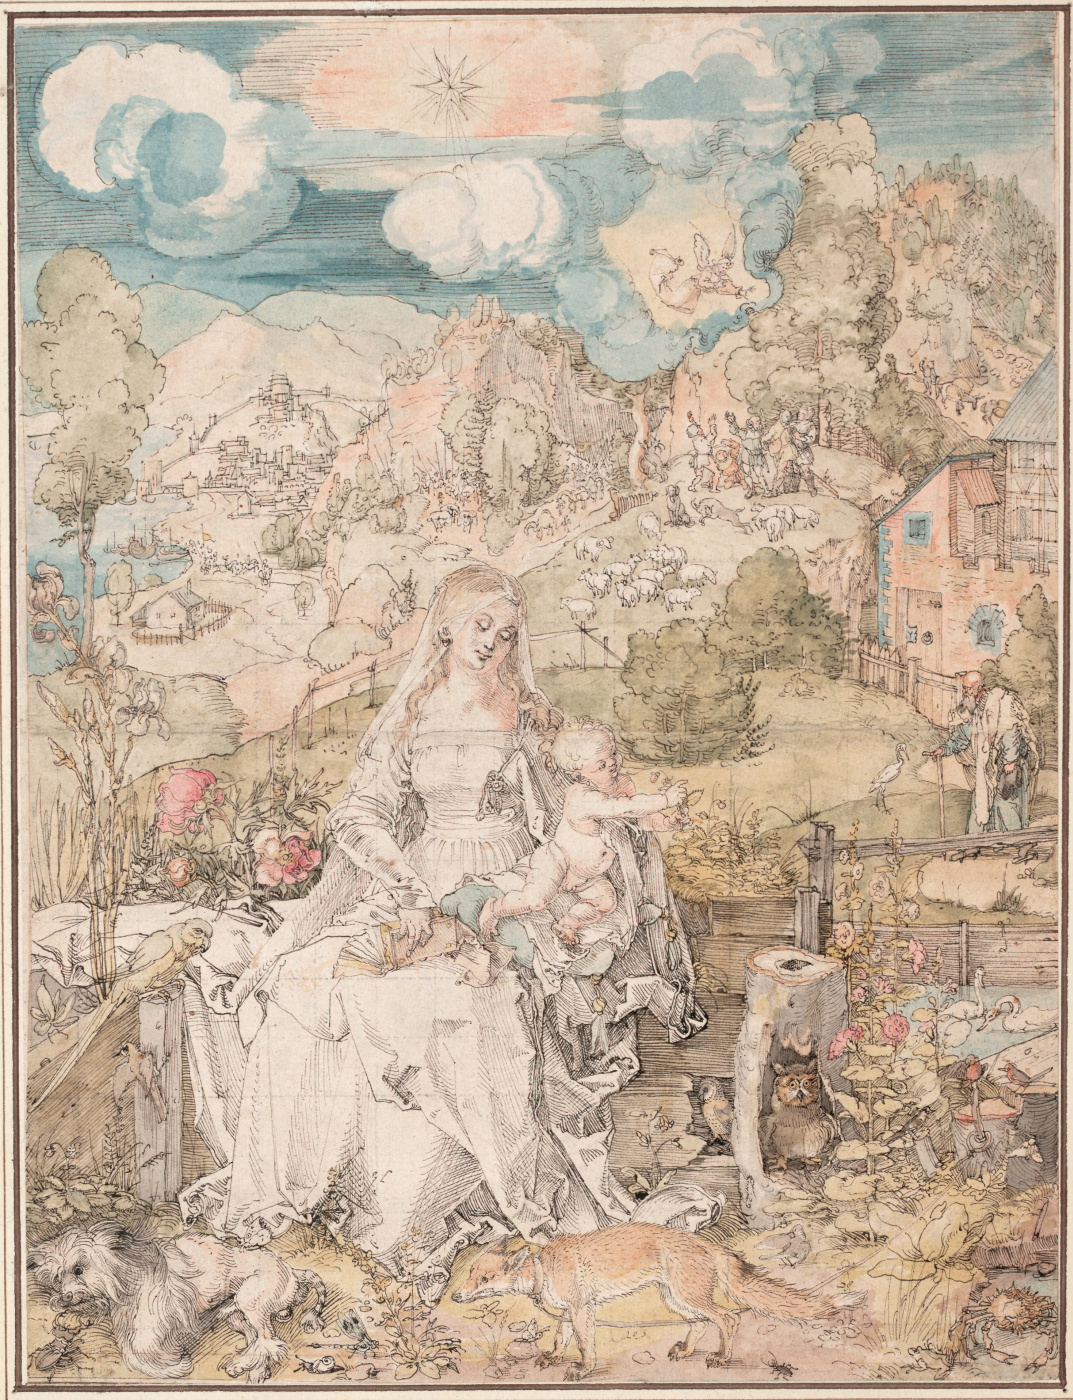 Albrecht Durer. The Virgin with a Multitude of Animals